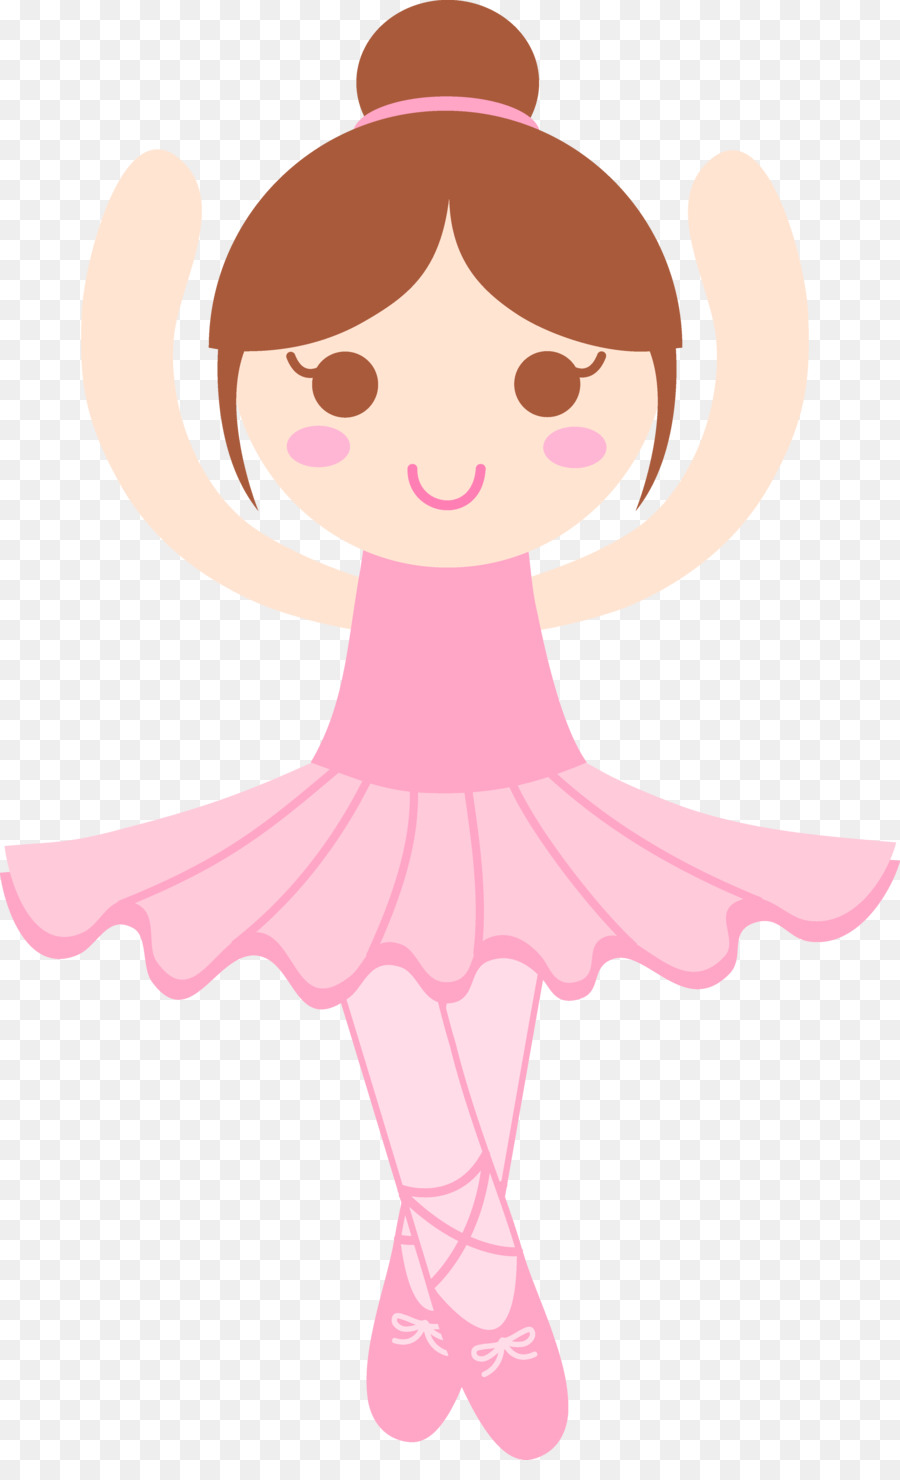 Ballet Dancer Drawing Clip Art - Pink Si-Ballet Dancer Drawing Clip art - pink singer-5